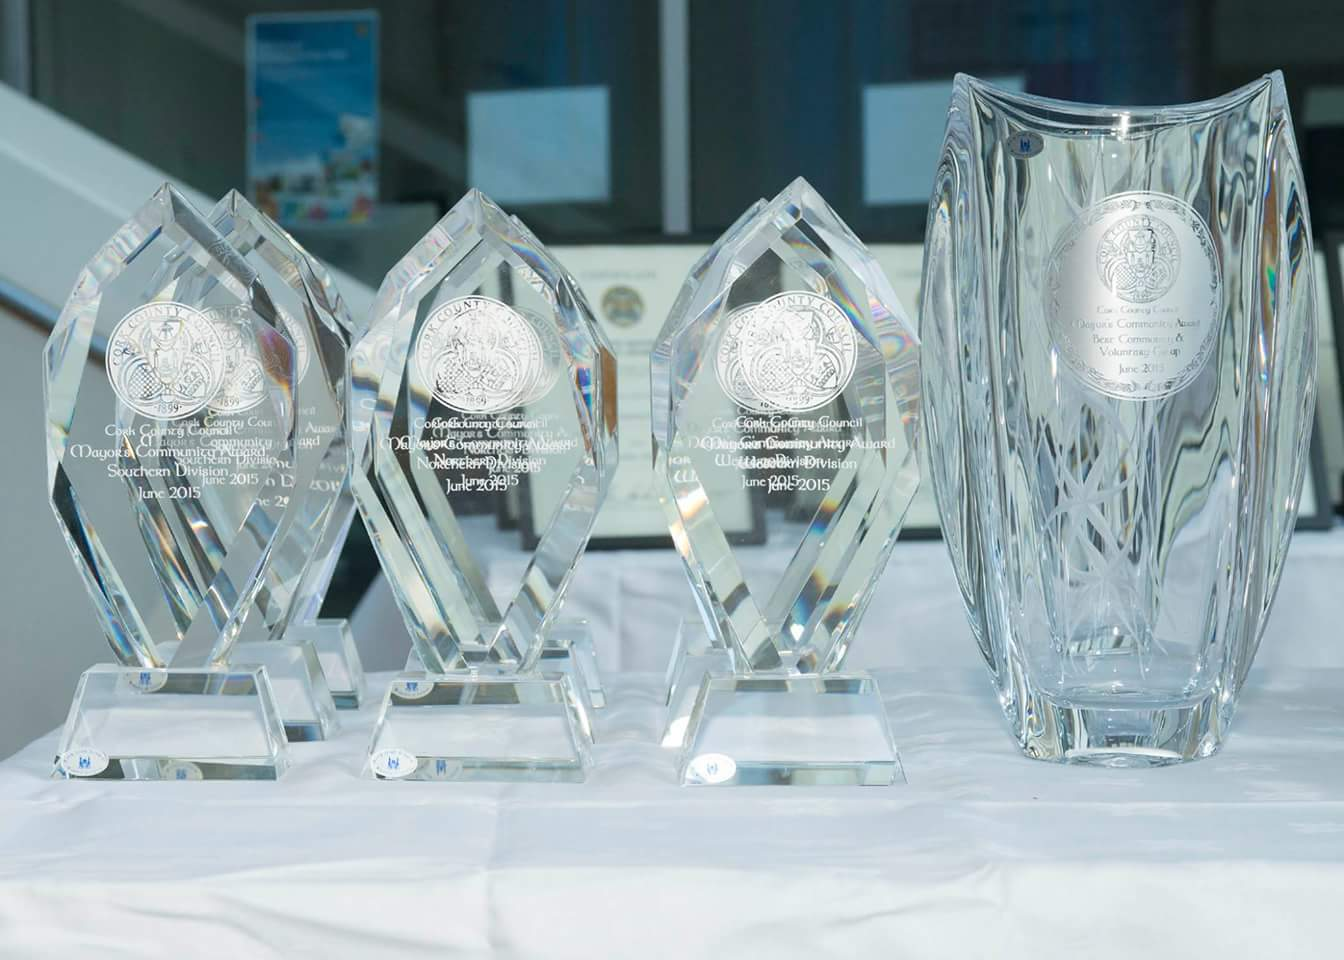 Mayors Awards